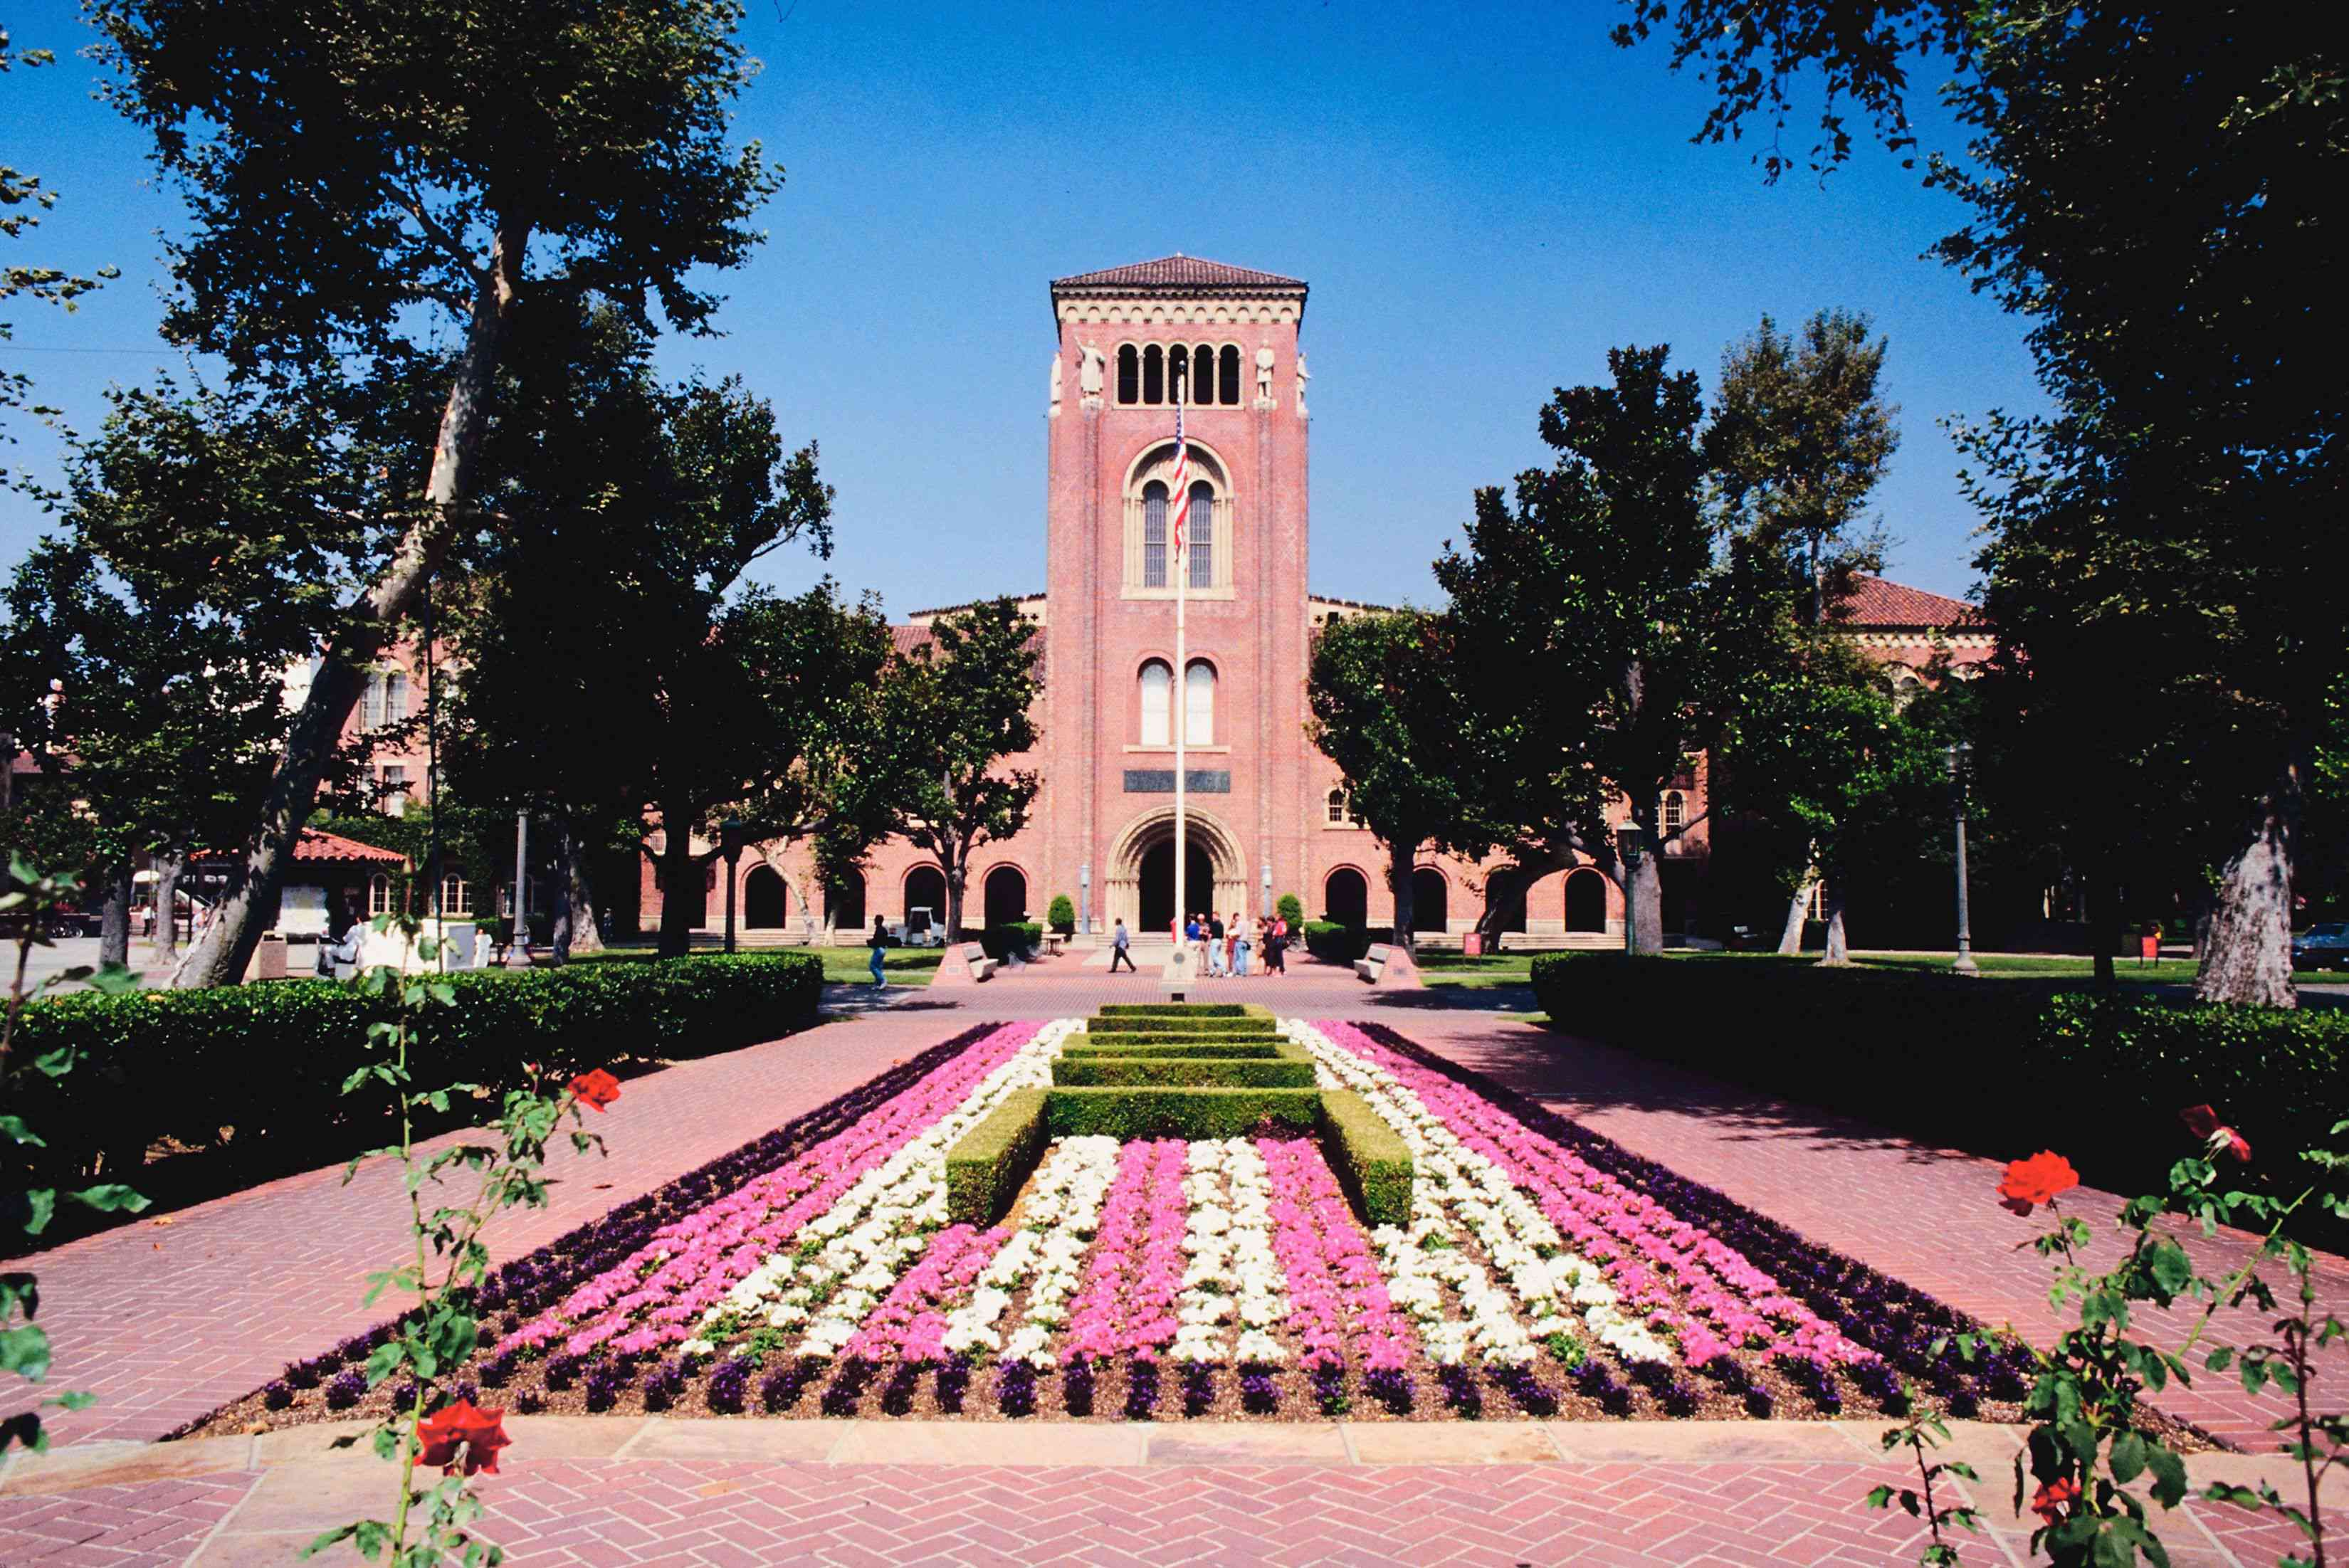 University of Southern California campus, Los Angeles, California, USA